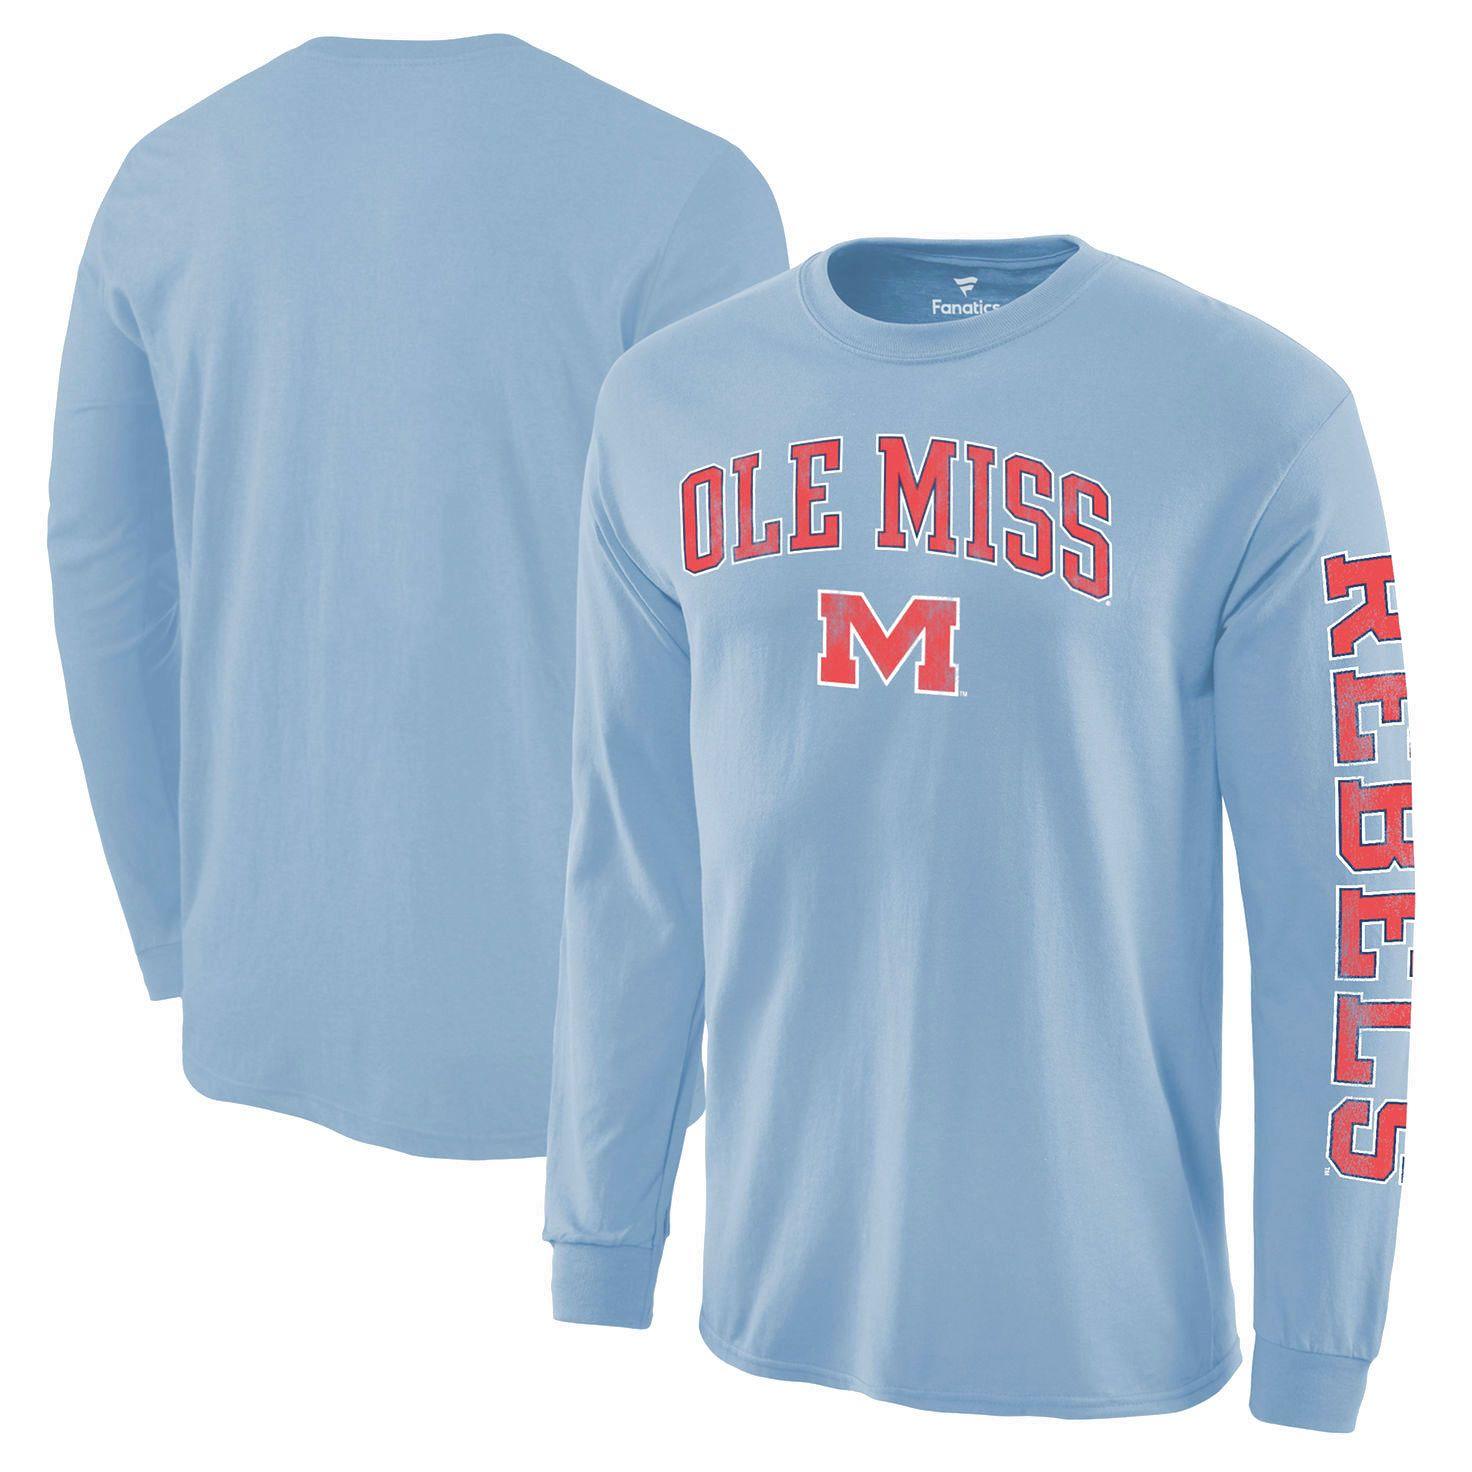 Ole Miss Rebels Distressed Arch Over Logo Long Sleeve Hit T Shirt Light Blue 19 99 North Carolina Tar Heels Unc Apparel Long Sleeve Tshirt Men